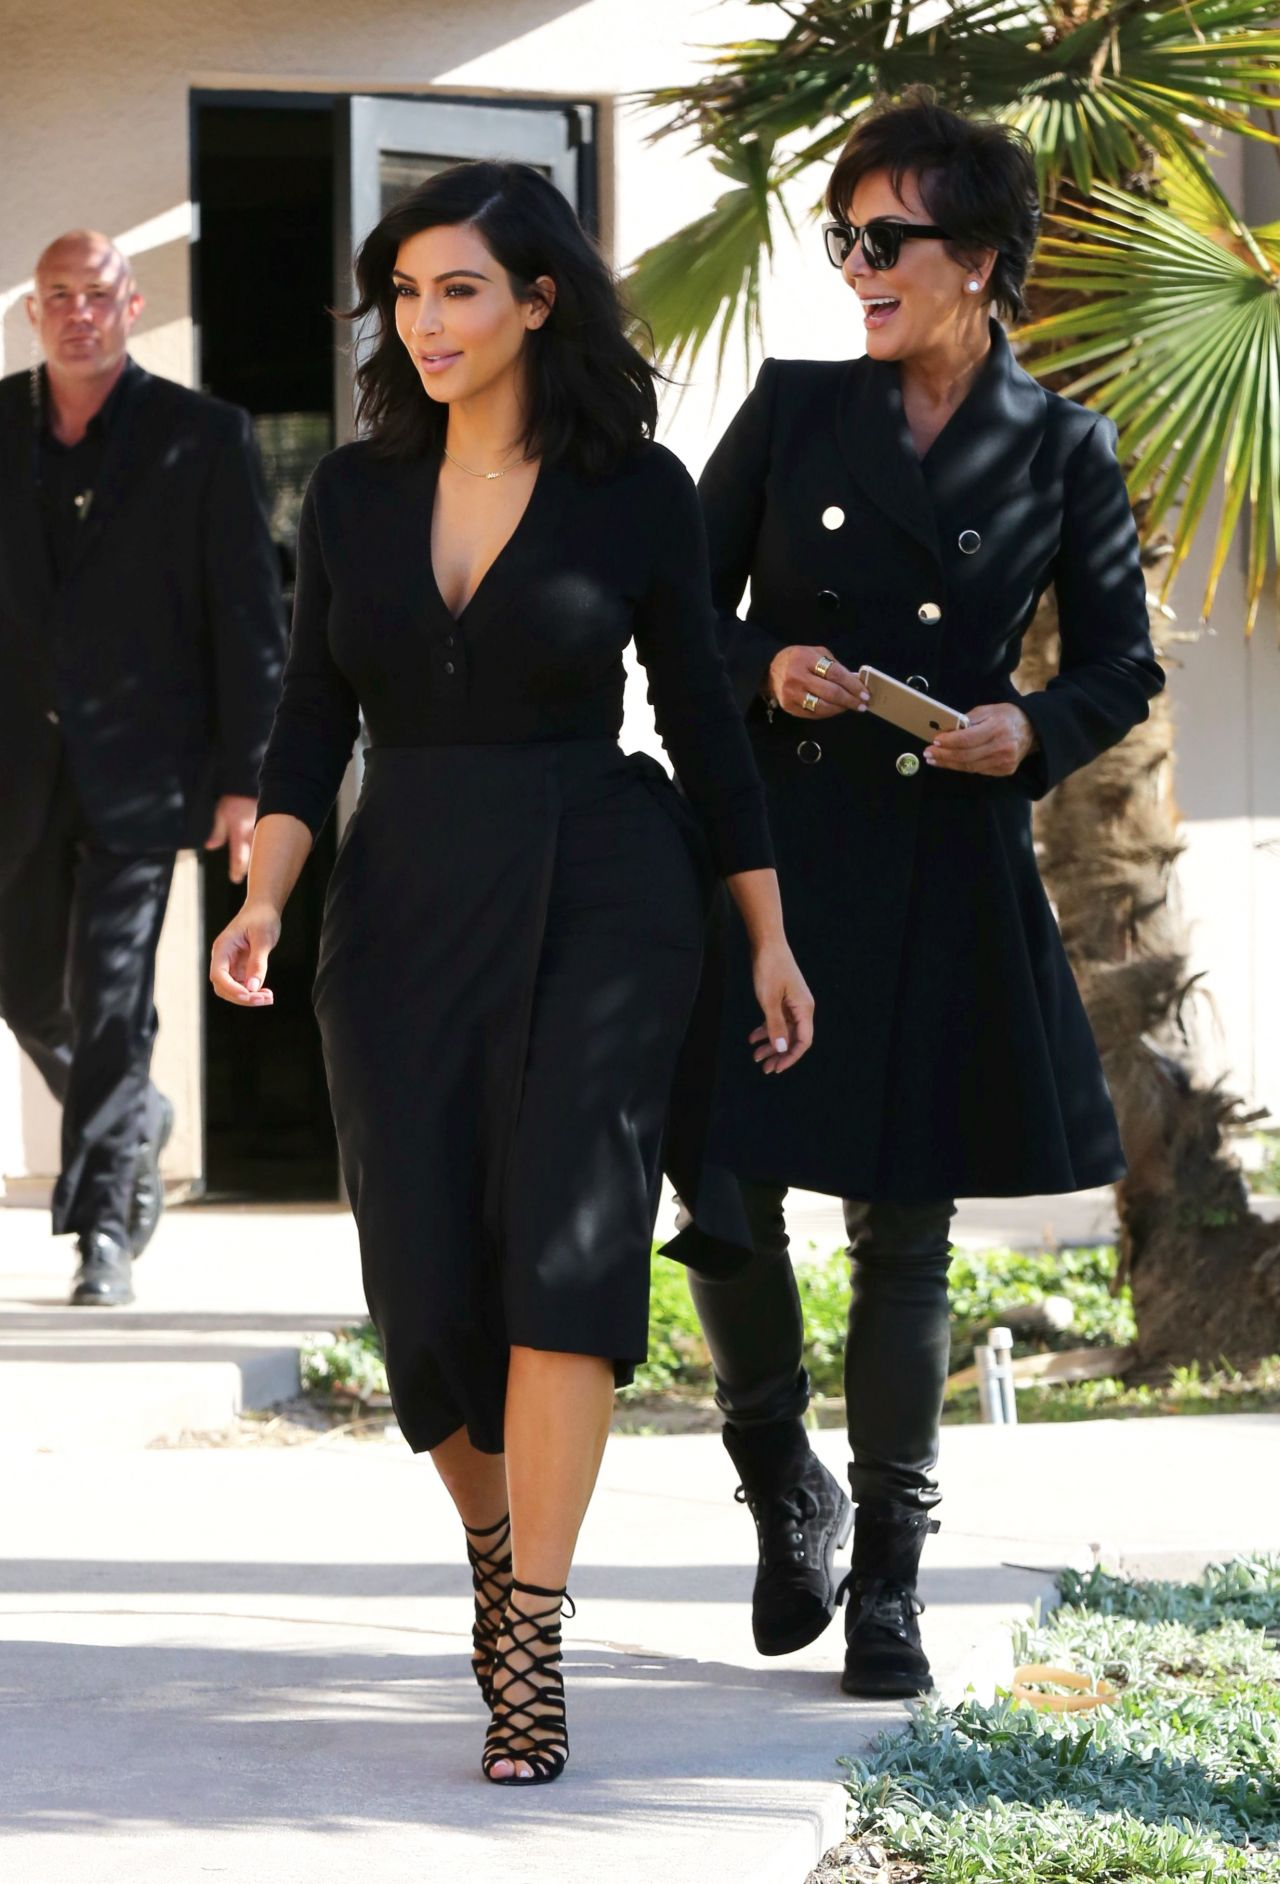 Kim Kardashian 2015 Fotos De Famosos Style Filming In